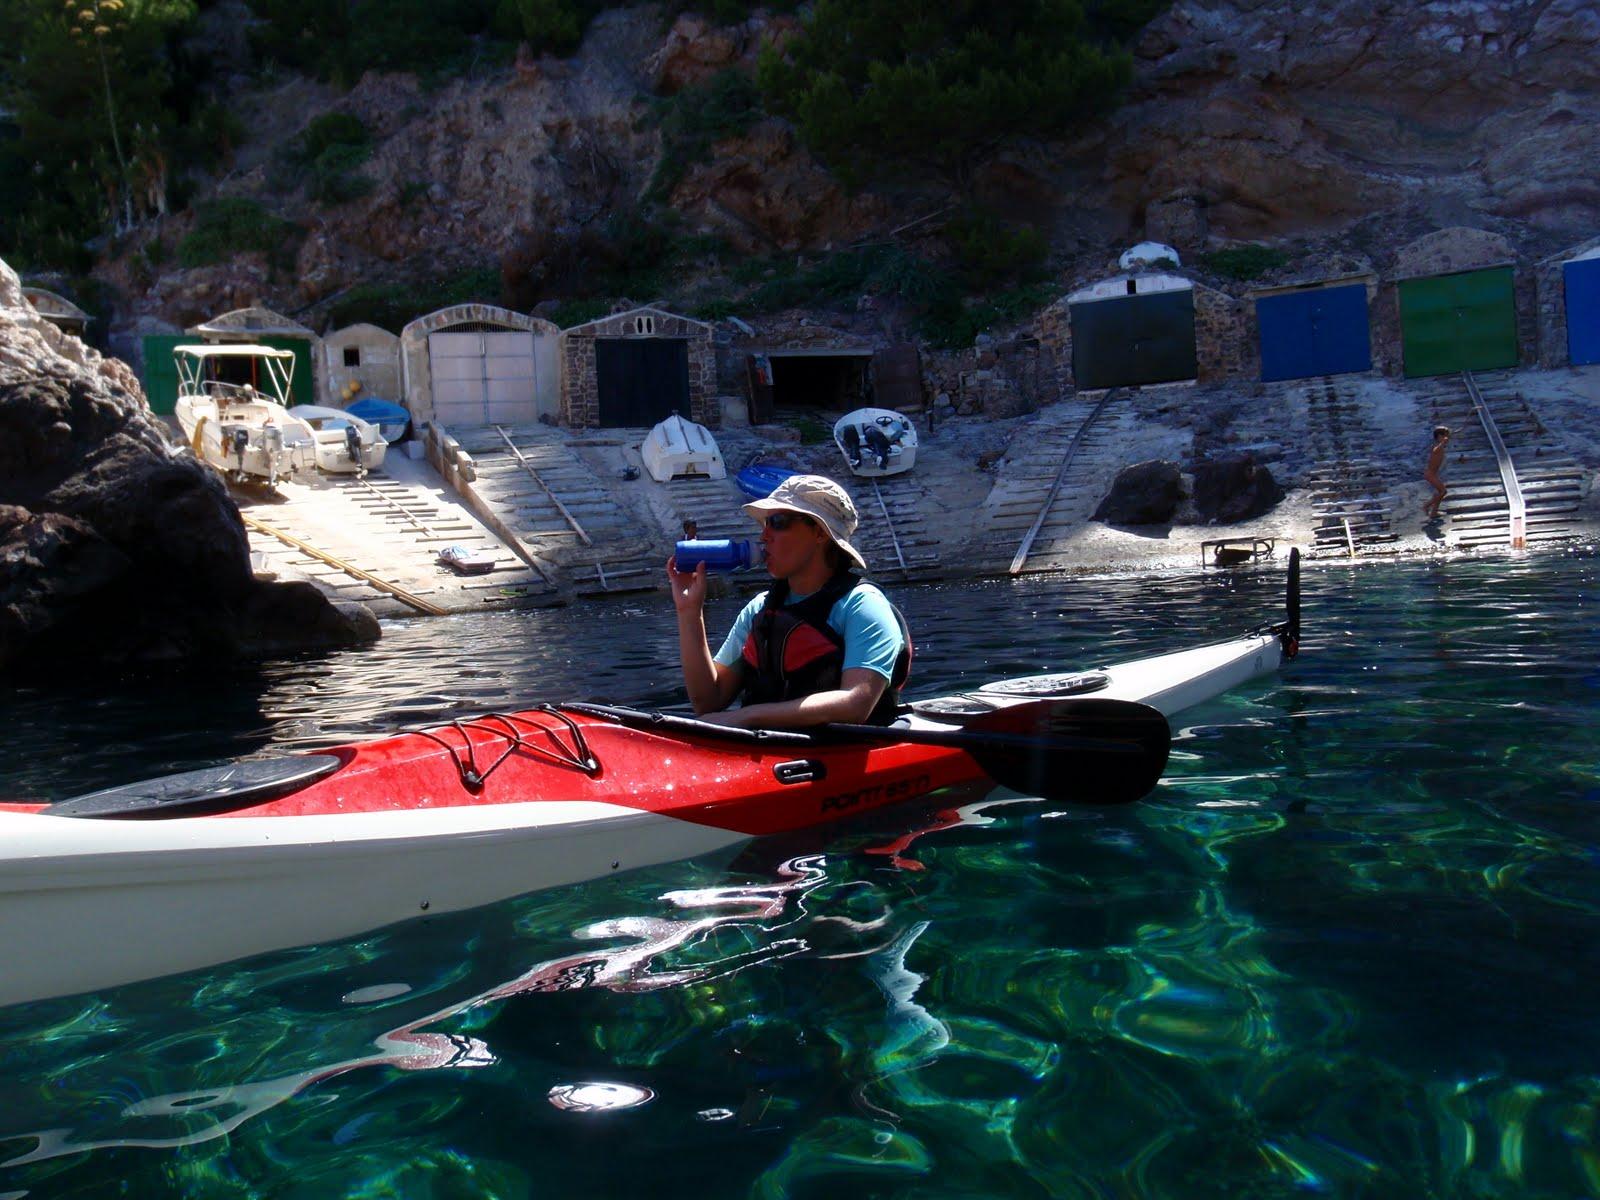 Mallorca t'estim!: S'Estaca